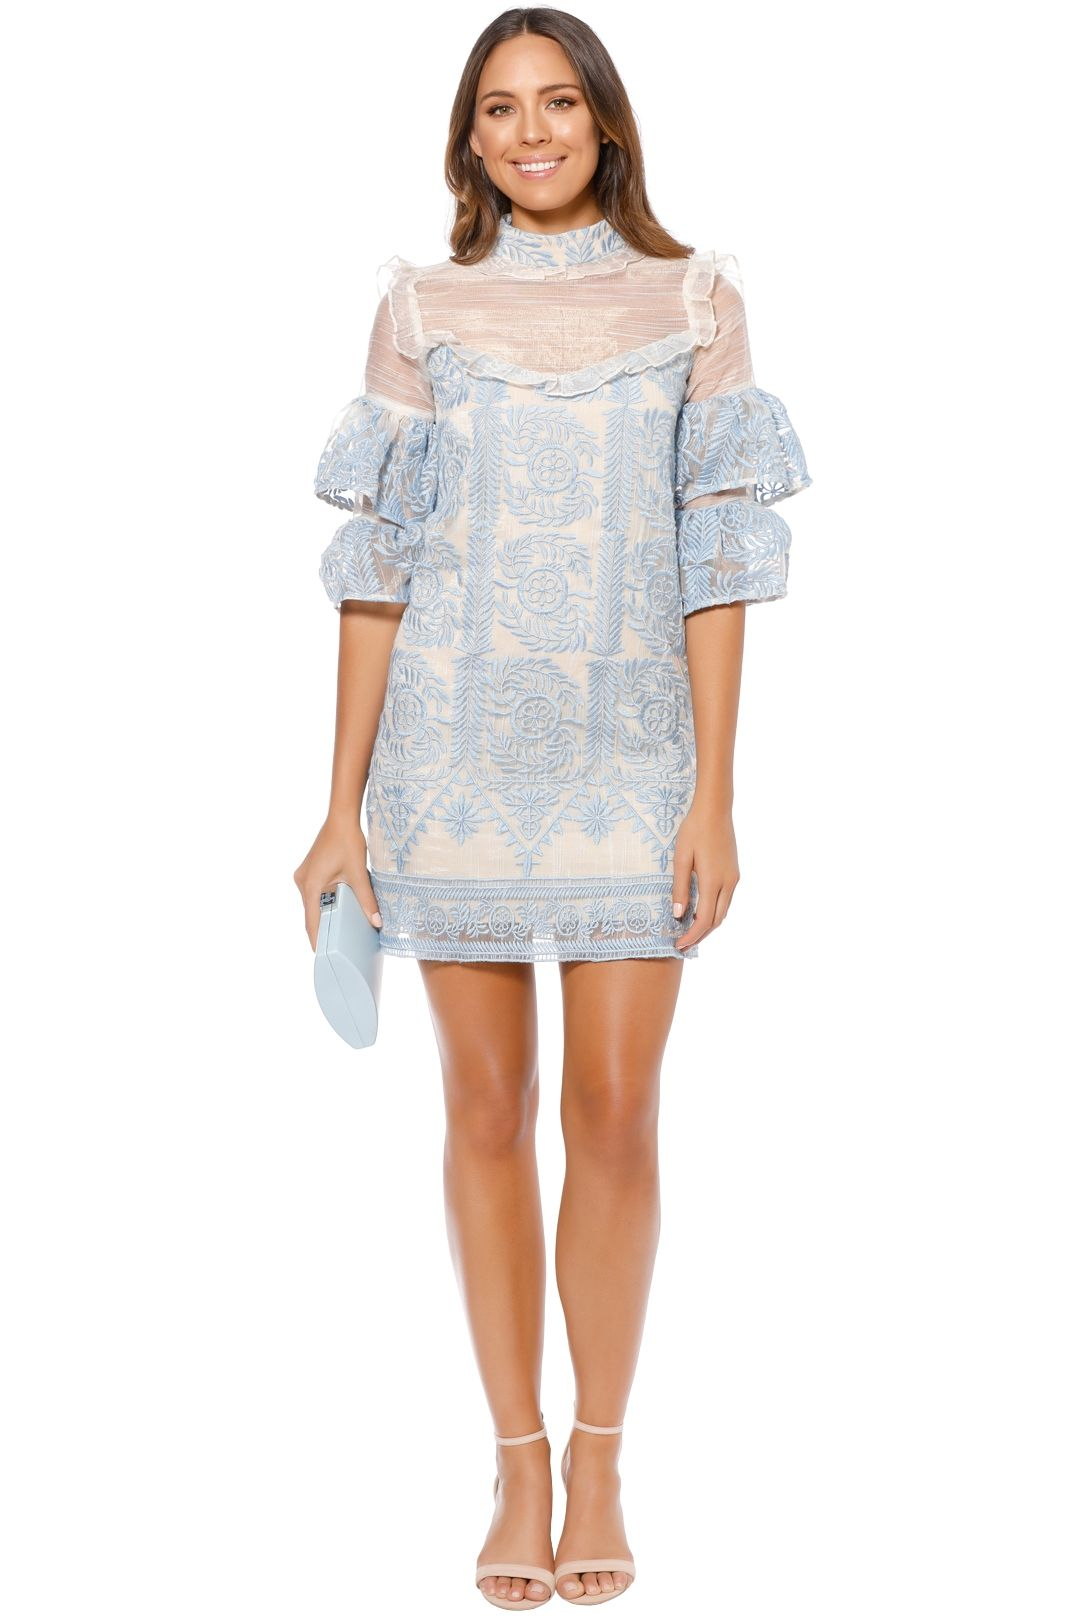 Elliatt - Voltaire Dress - Sky Blue - Front